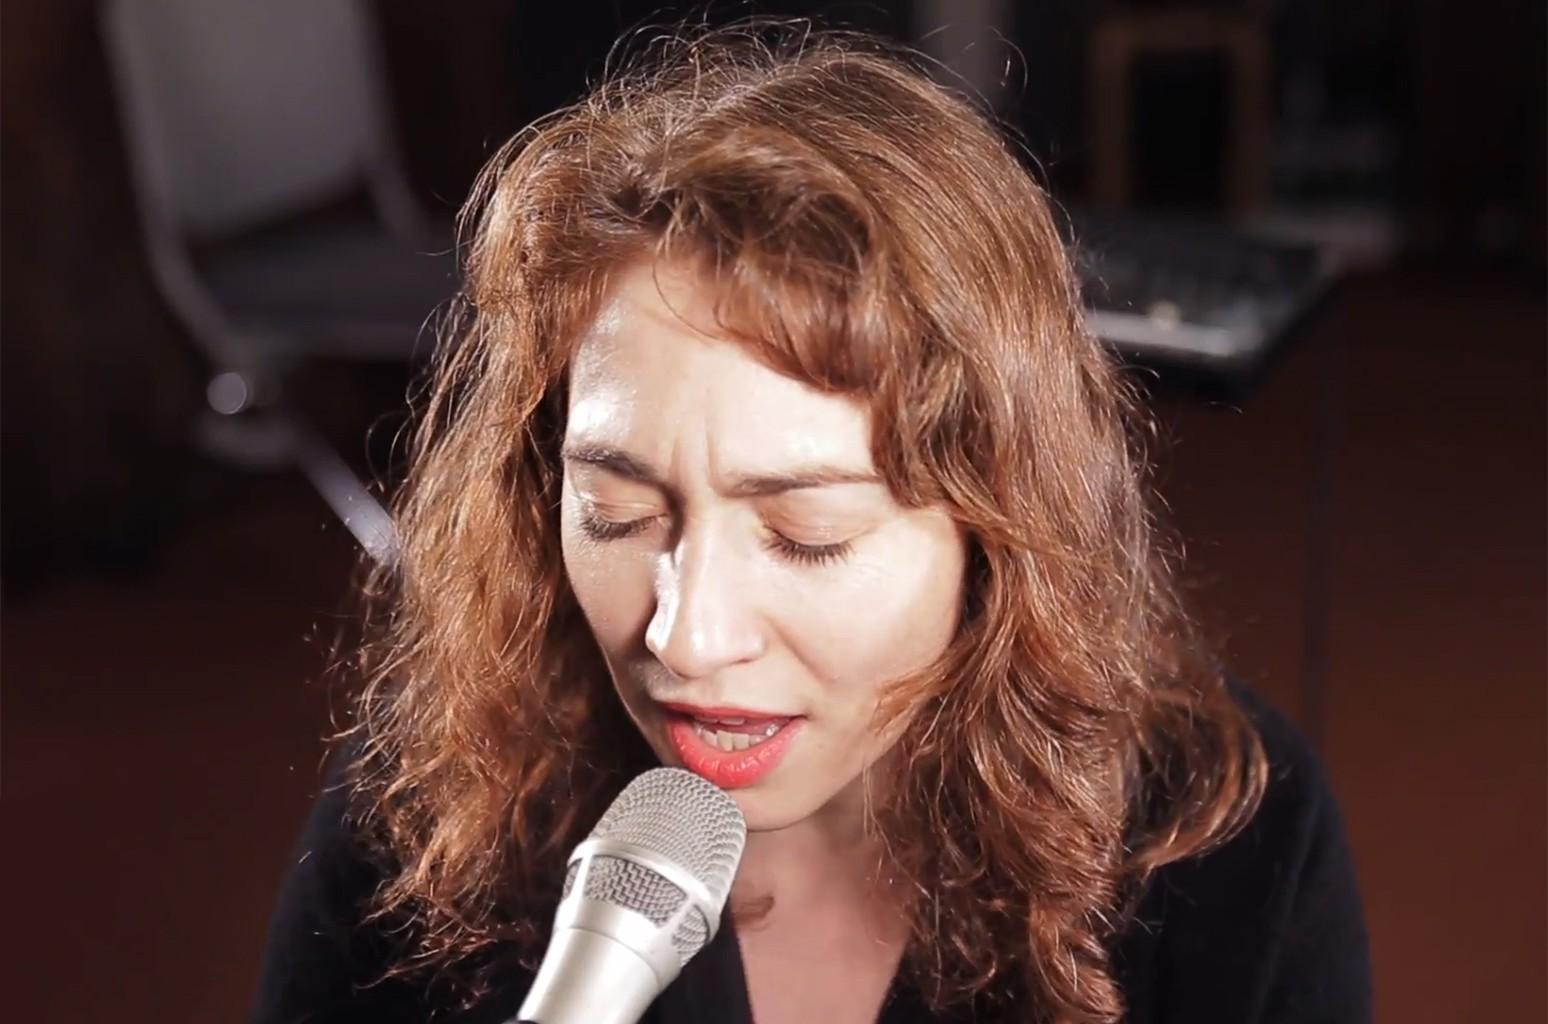 Regina Spektor performs at WFUV